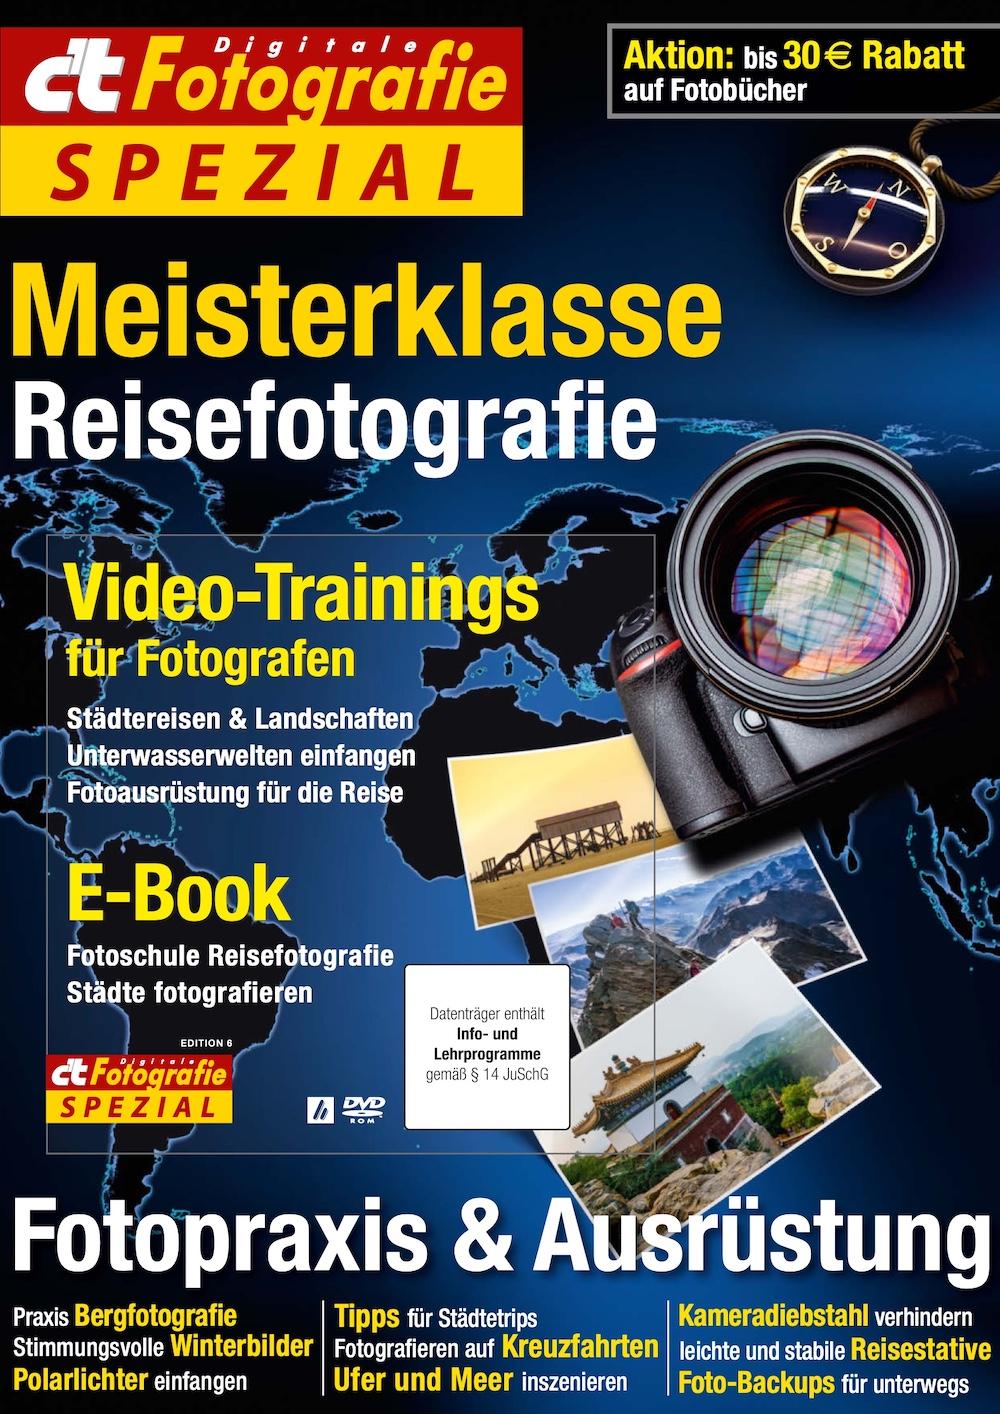 c't Digitale Fotografie Spezial Meisterklasse Edition 6 2018